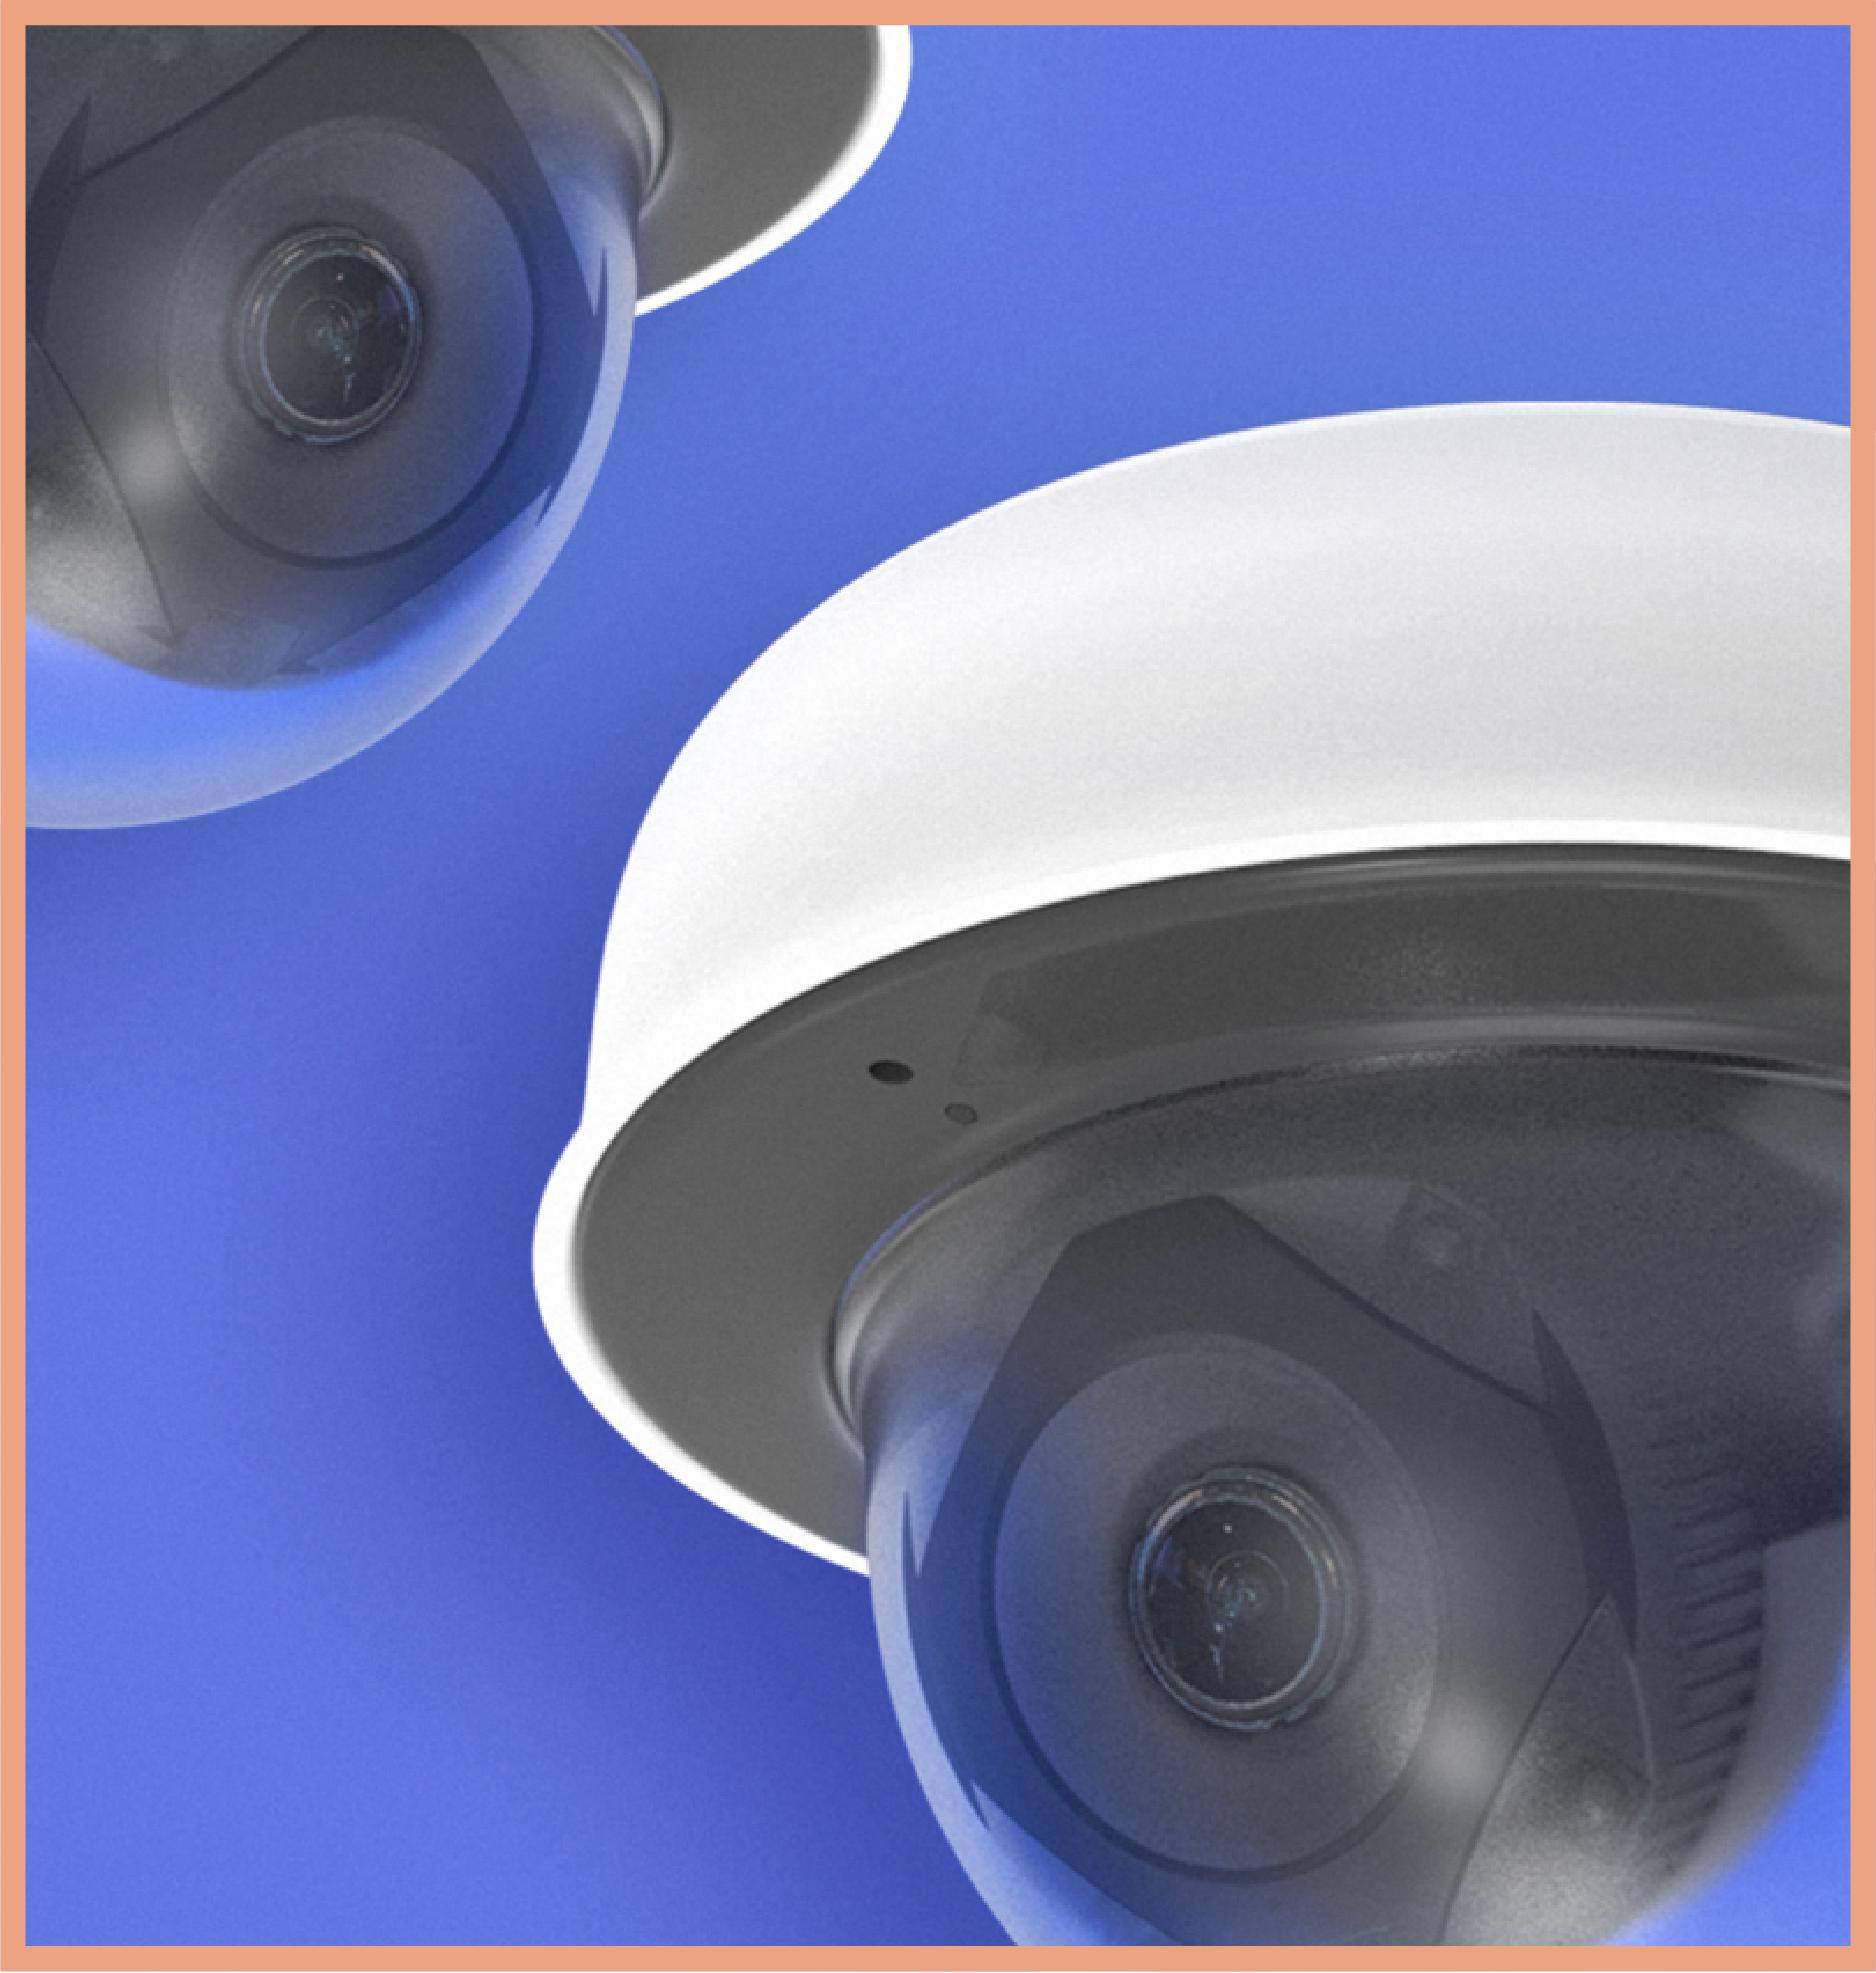 smart camera launch